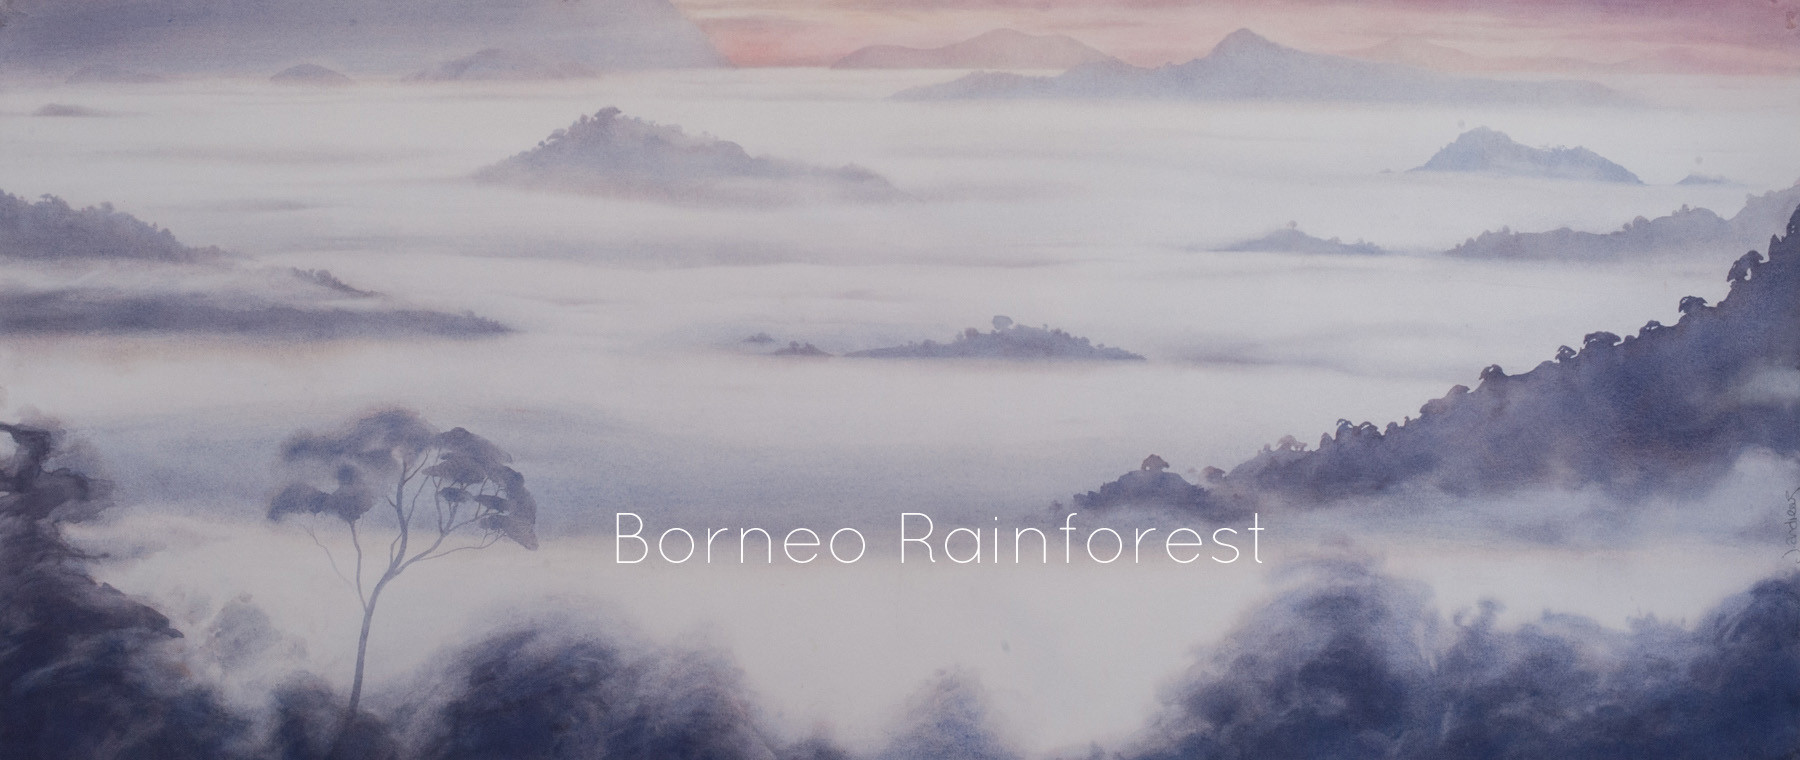 RainforestWords.jpg